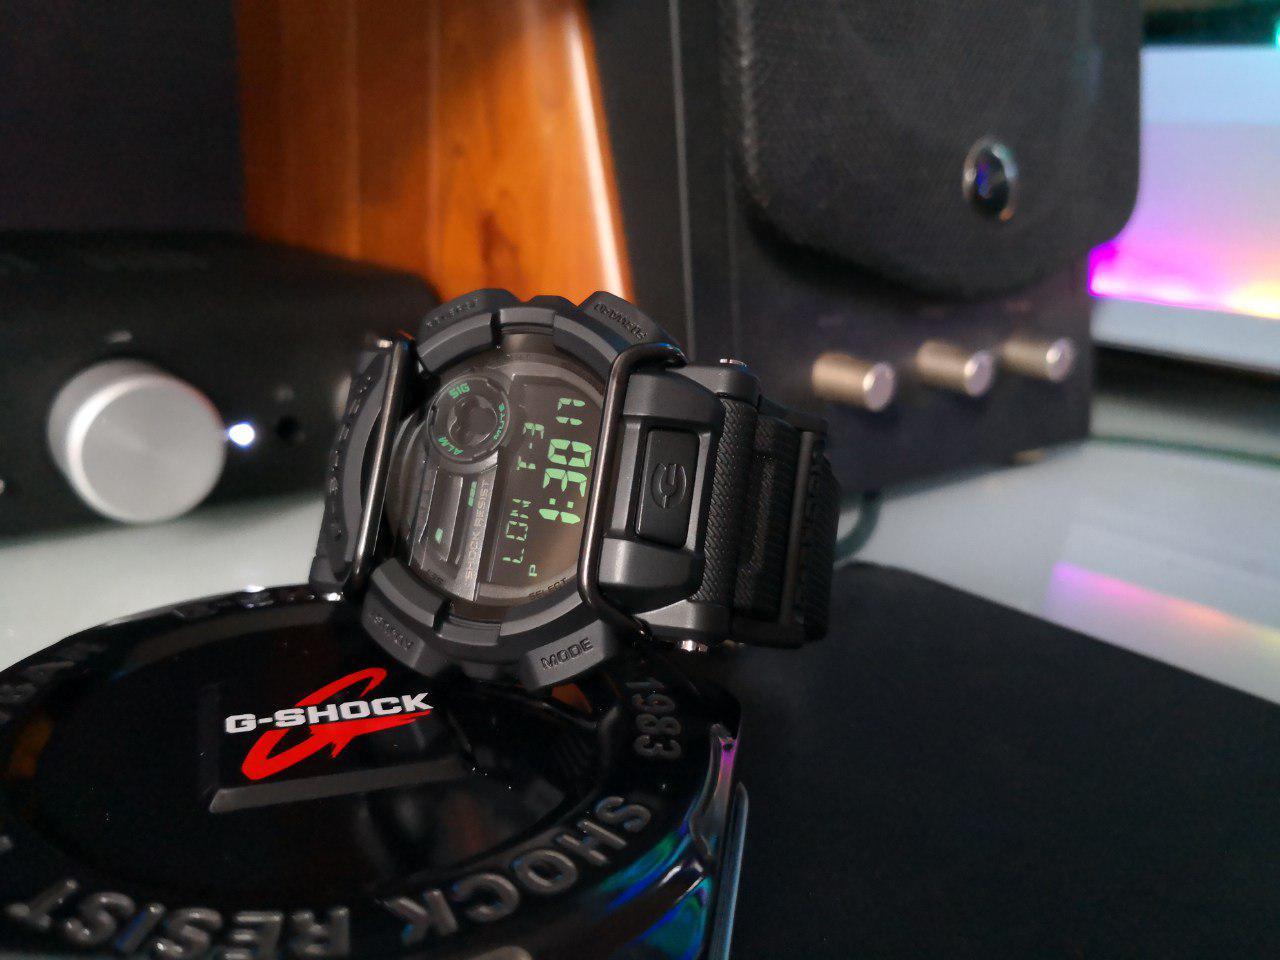 Casio G-Shock Men's Black Resin Strap Watch GD400MB-1D | Lazada Singapore